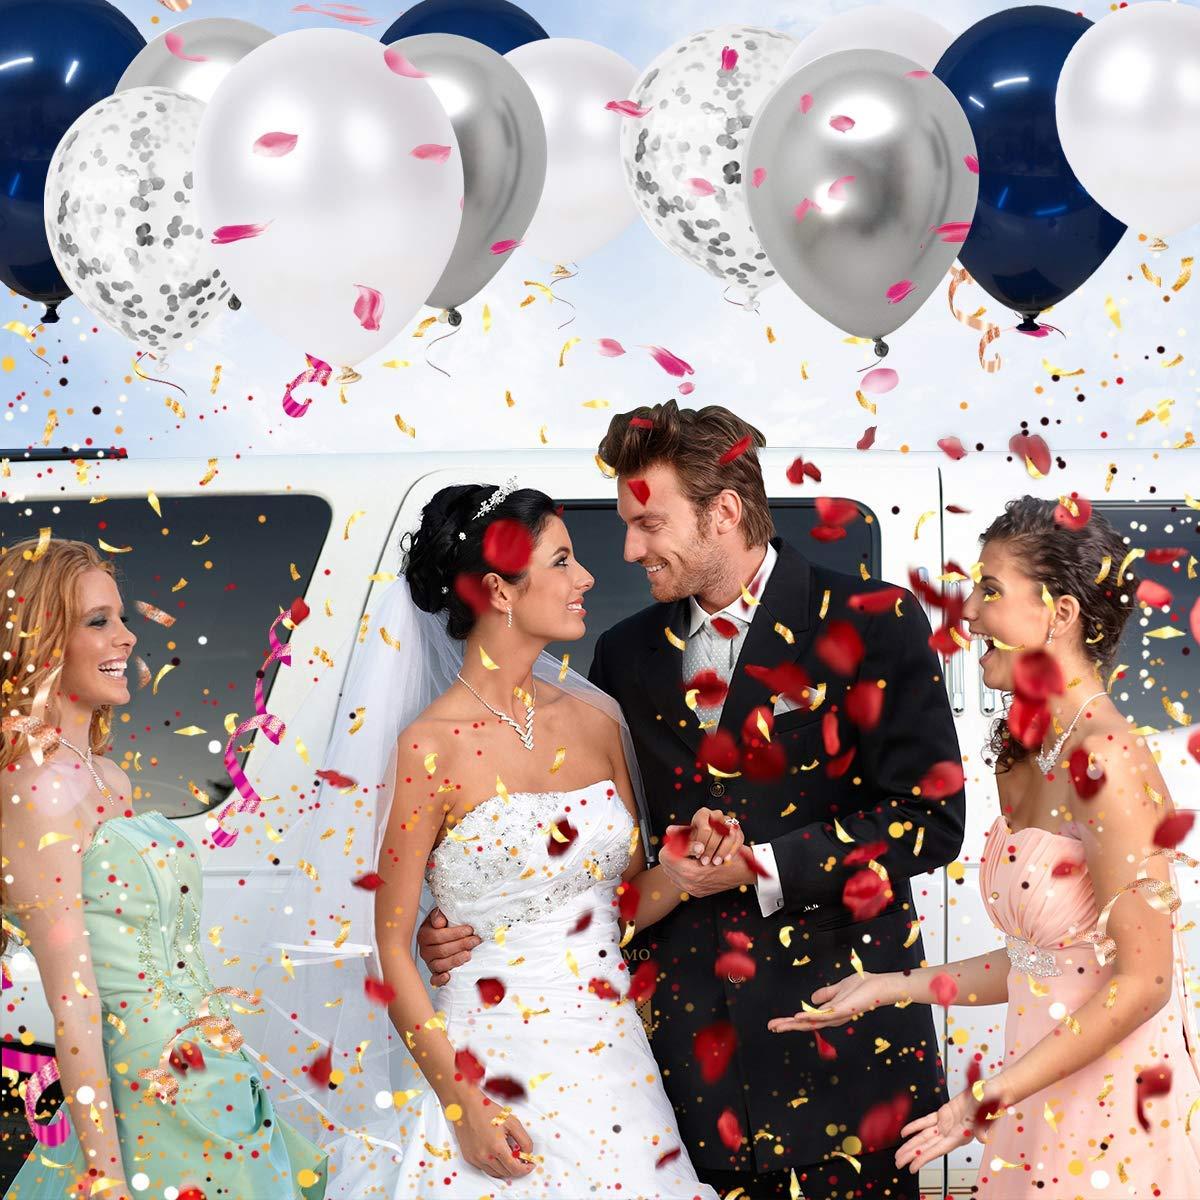 Disney Princess Blue Confetti 60 Confetti Balloon Latex Helium Balloons 12 Inch for Girls Birthday /& Christening Wedding Party Decorations JOJOR 60 Pieces Pink Balloons Baby Shower